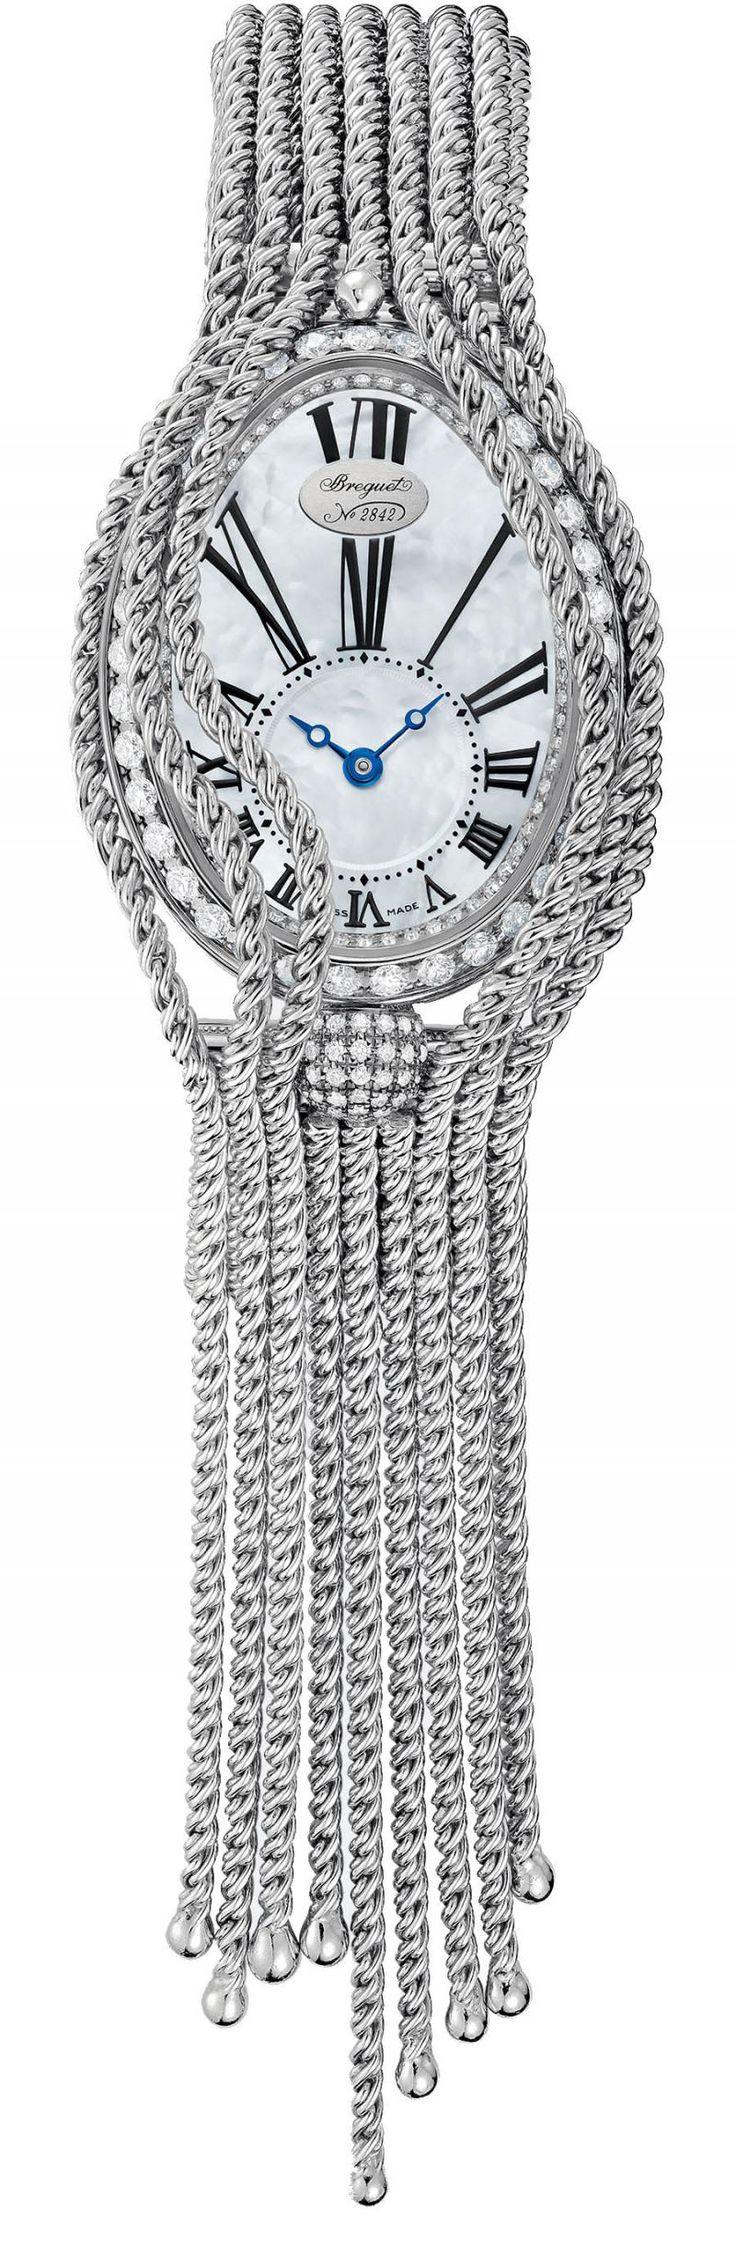 Часы женские Breguet 8928BB/51/J60 DD0D Reine De Naples 8928 - золотые, белые - швейцарские женские наручные часы браслет